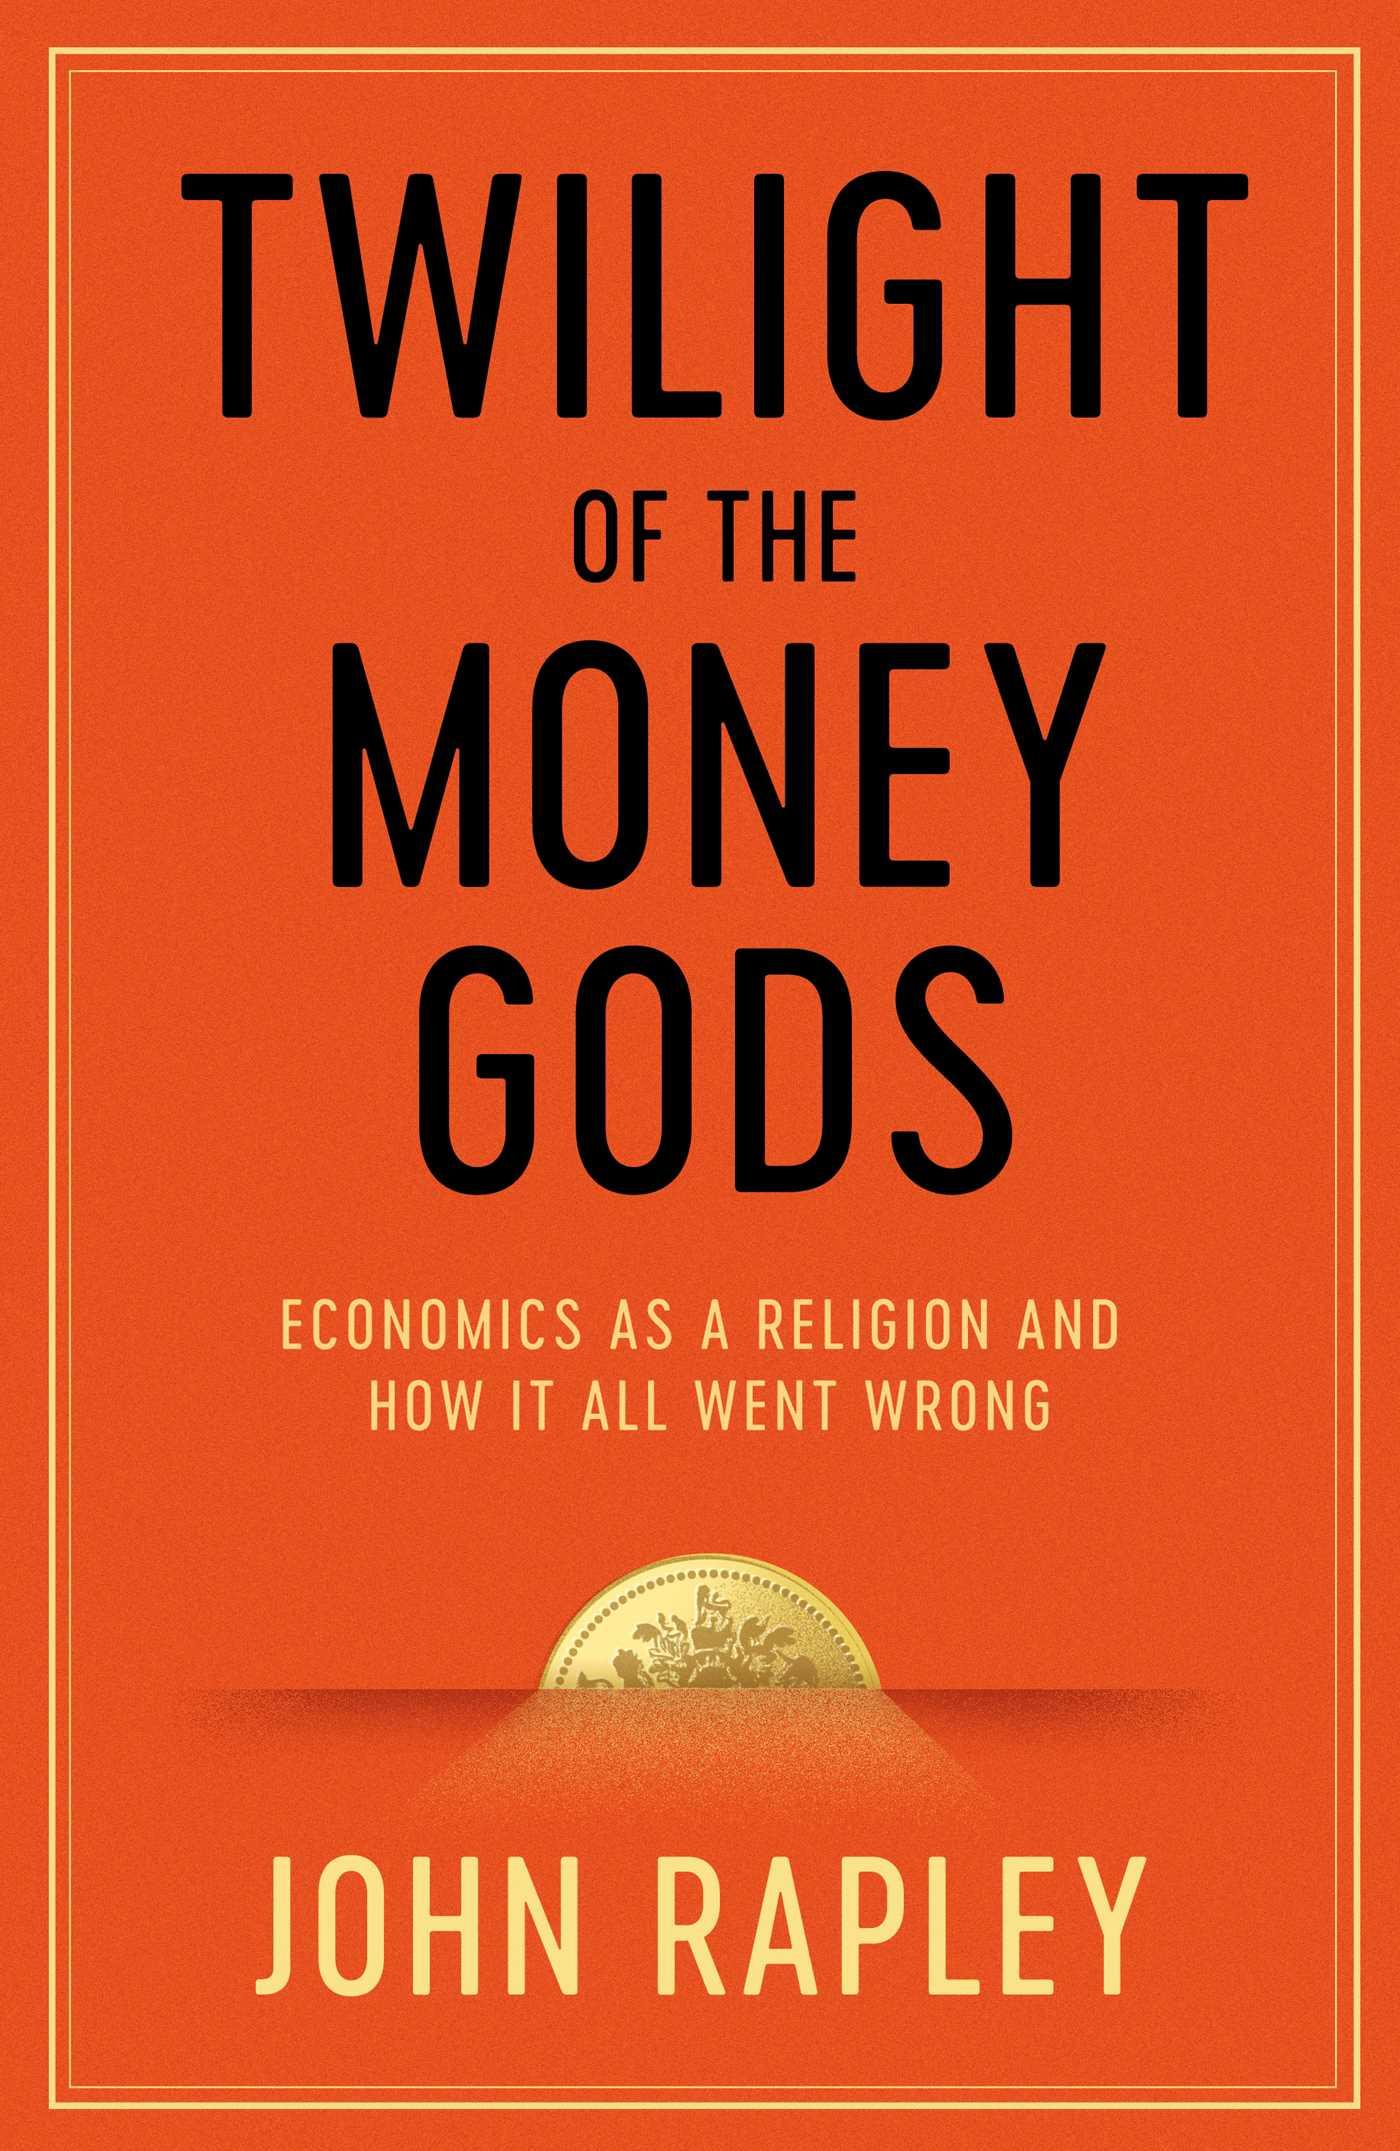 Twilight of the money gods 9781471152740 hr